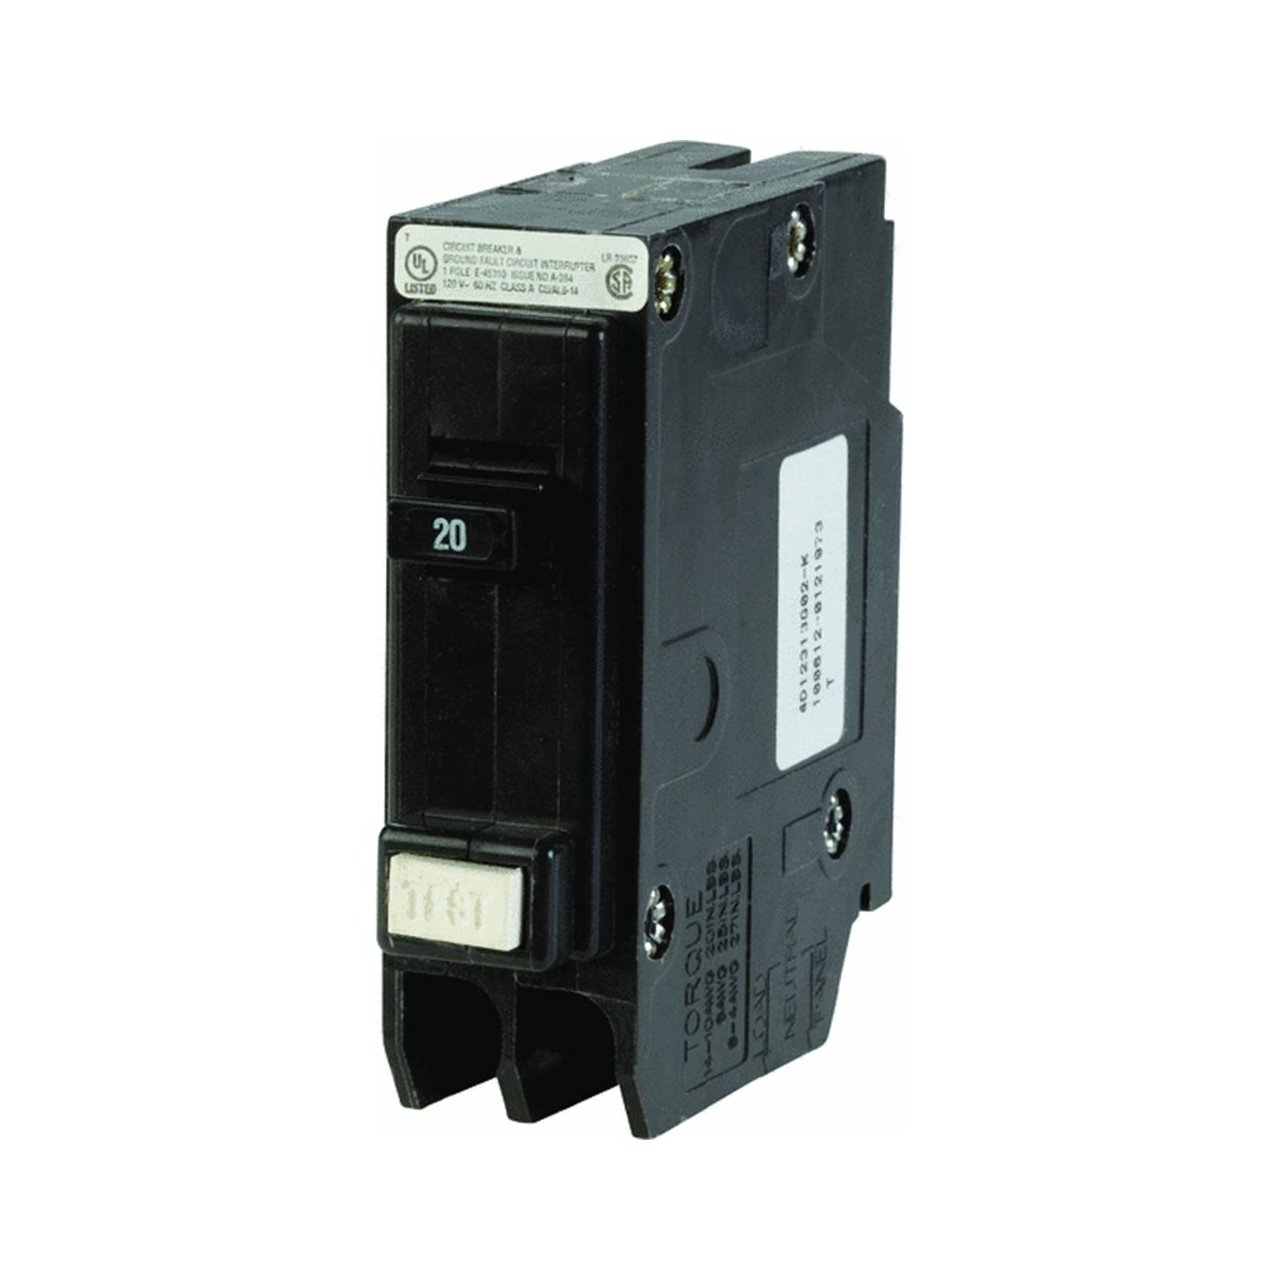 61pzIJl6f1L._SL1280_ eaton corporation gfcb120cs single pole ground fault interrupter eaton gfci breaker wiring diagram at gsmx.co